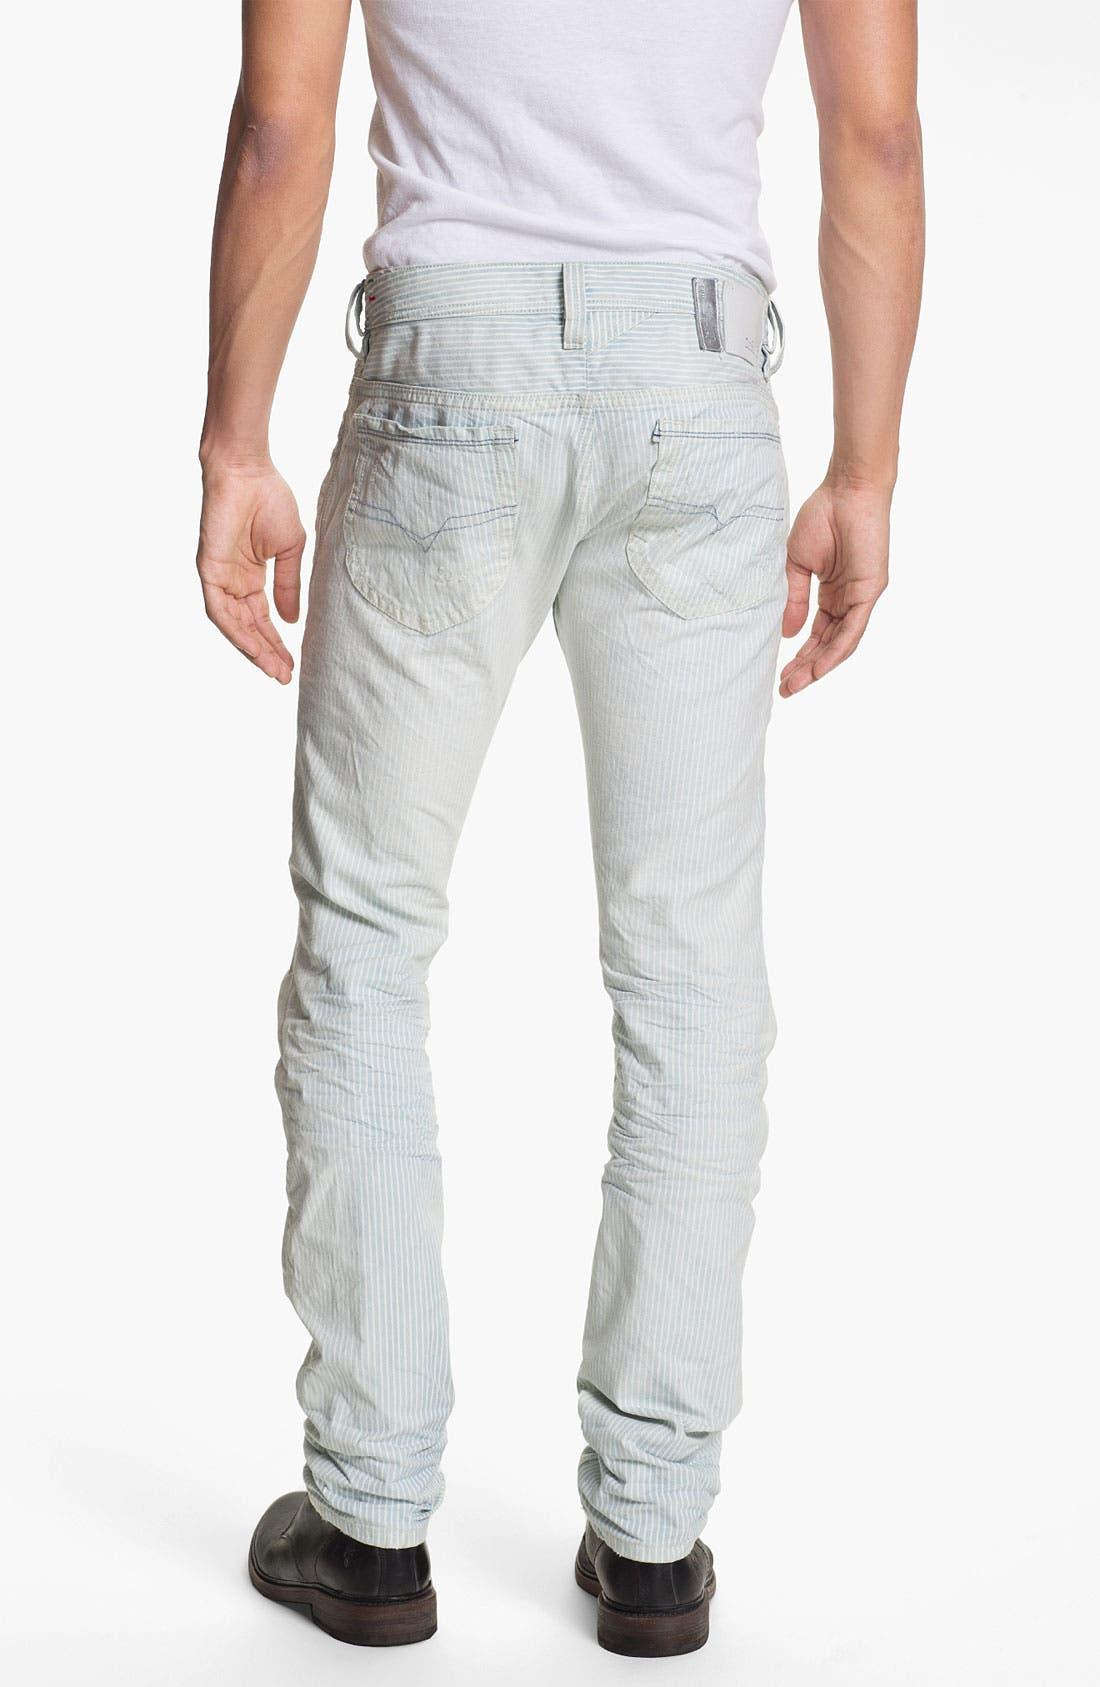 Alternate Image 1 Selected - DIESEL® 'Thanaz' Slim Straight Leg Jeans (Blue Stripe)